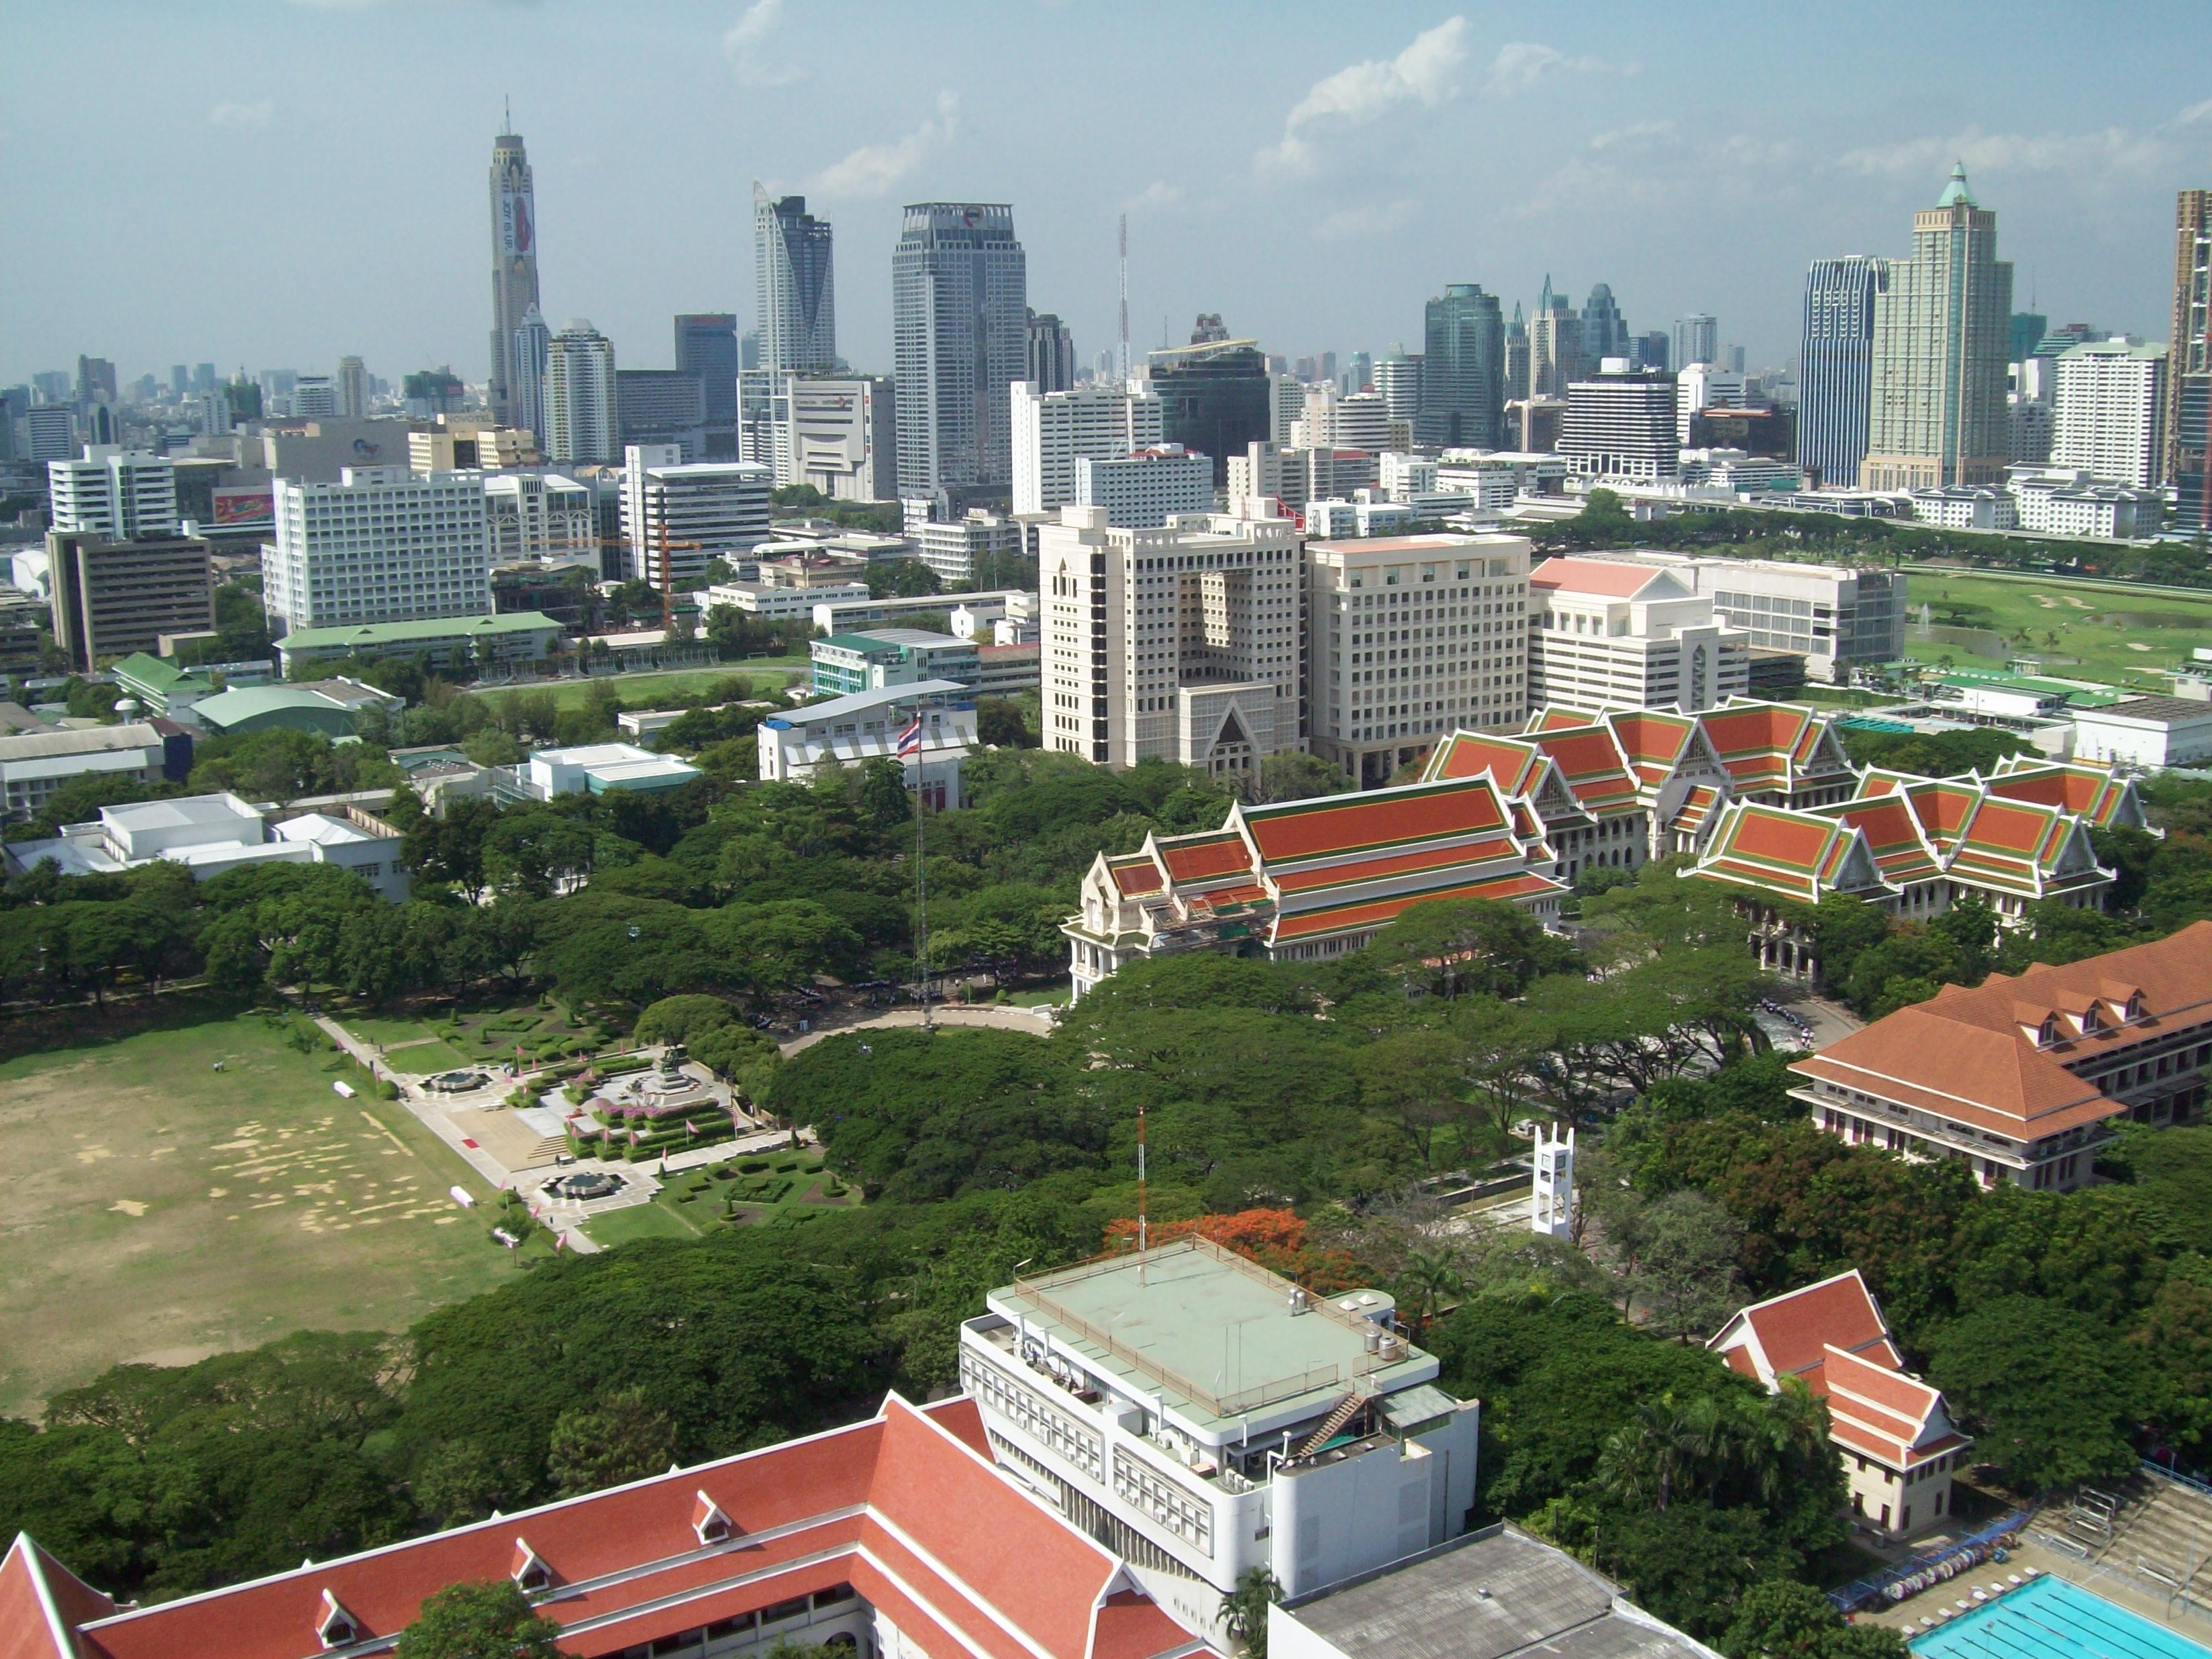 File:Chulalongkorn University Auditorium High View.JPG